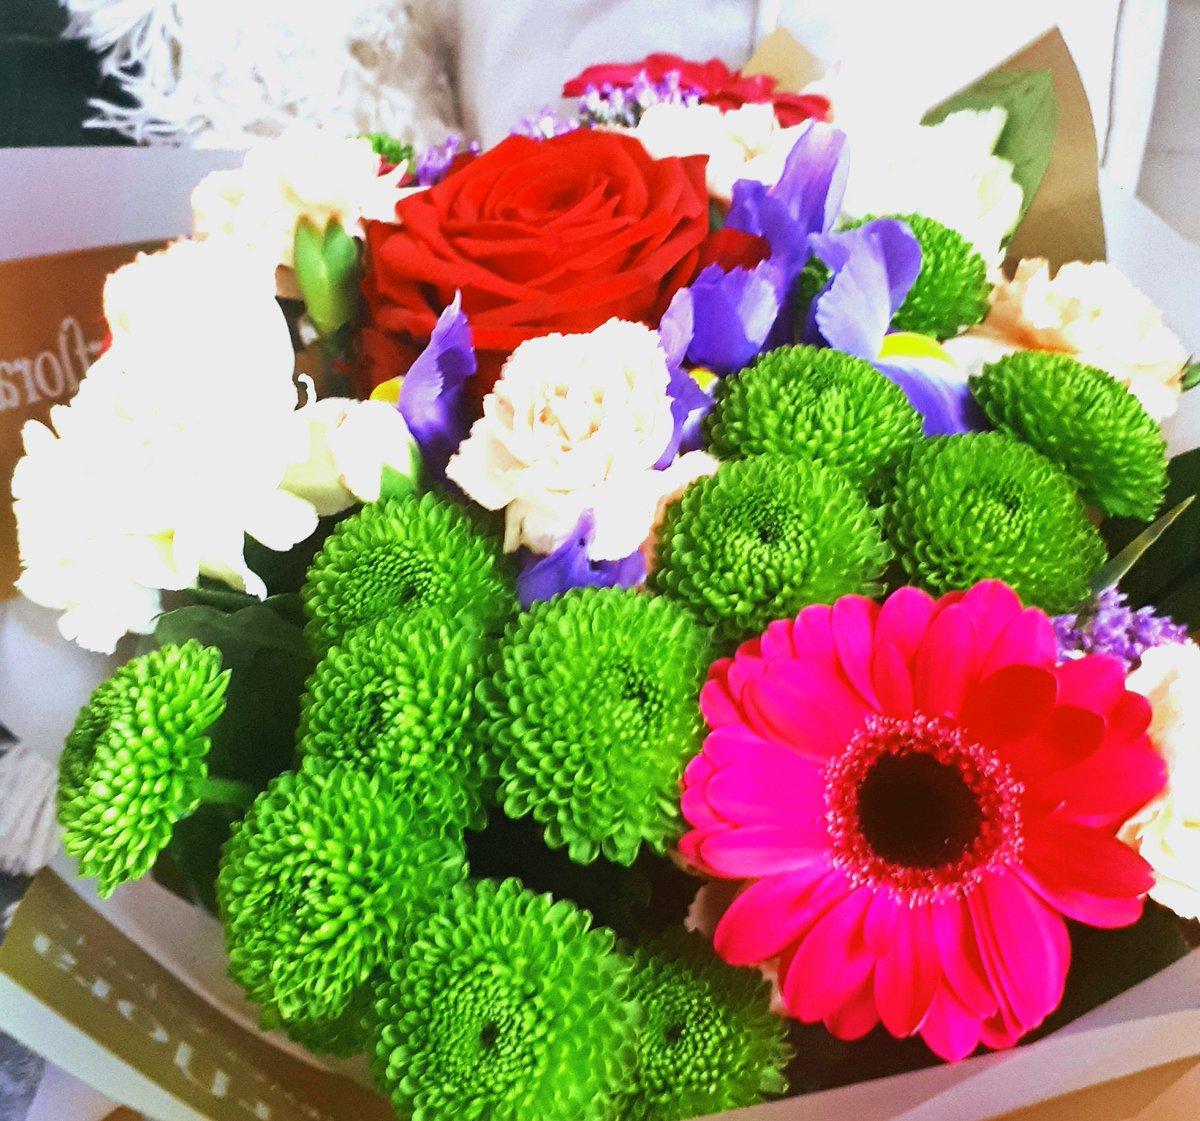 Colleen prendergast on twitter thank you raaudiobooks for my colleen prendergast on twitter thank you raaudiobooks for my beautiful flowers such a lovely surprise xxx izmirmasajfo